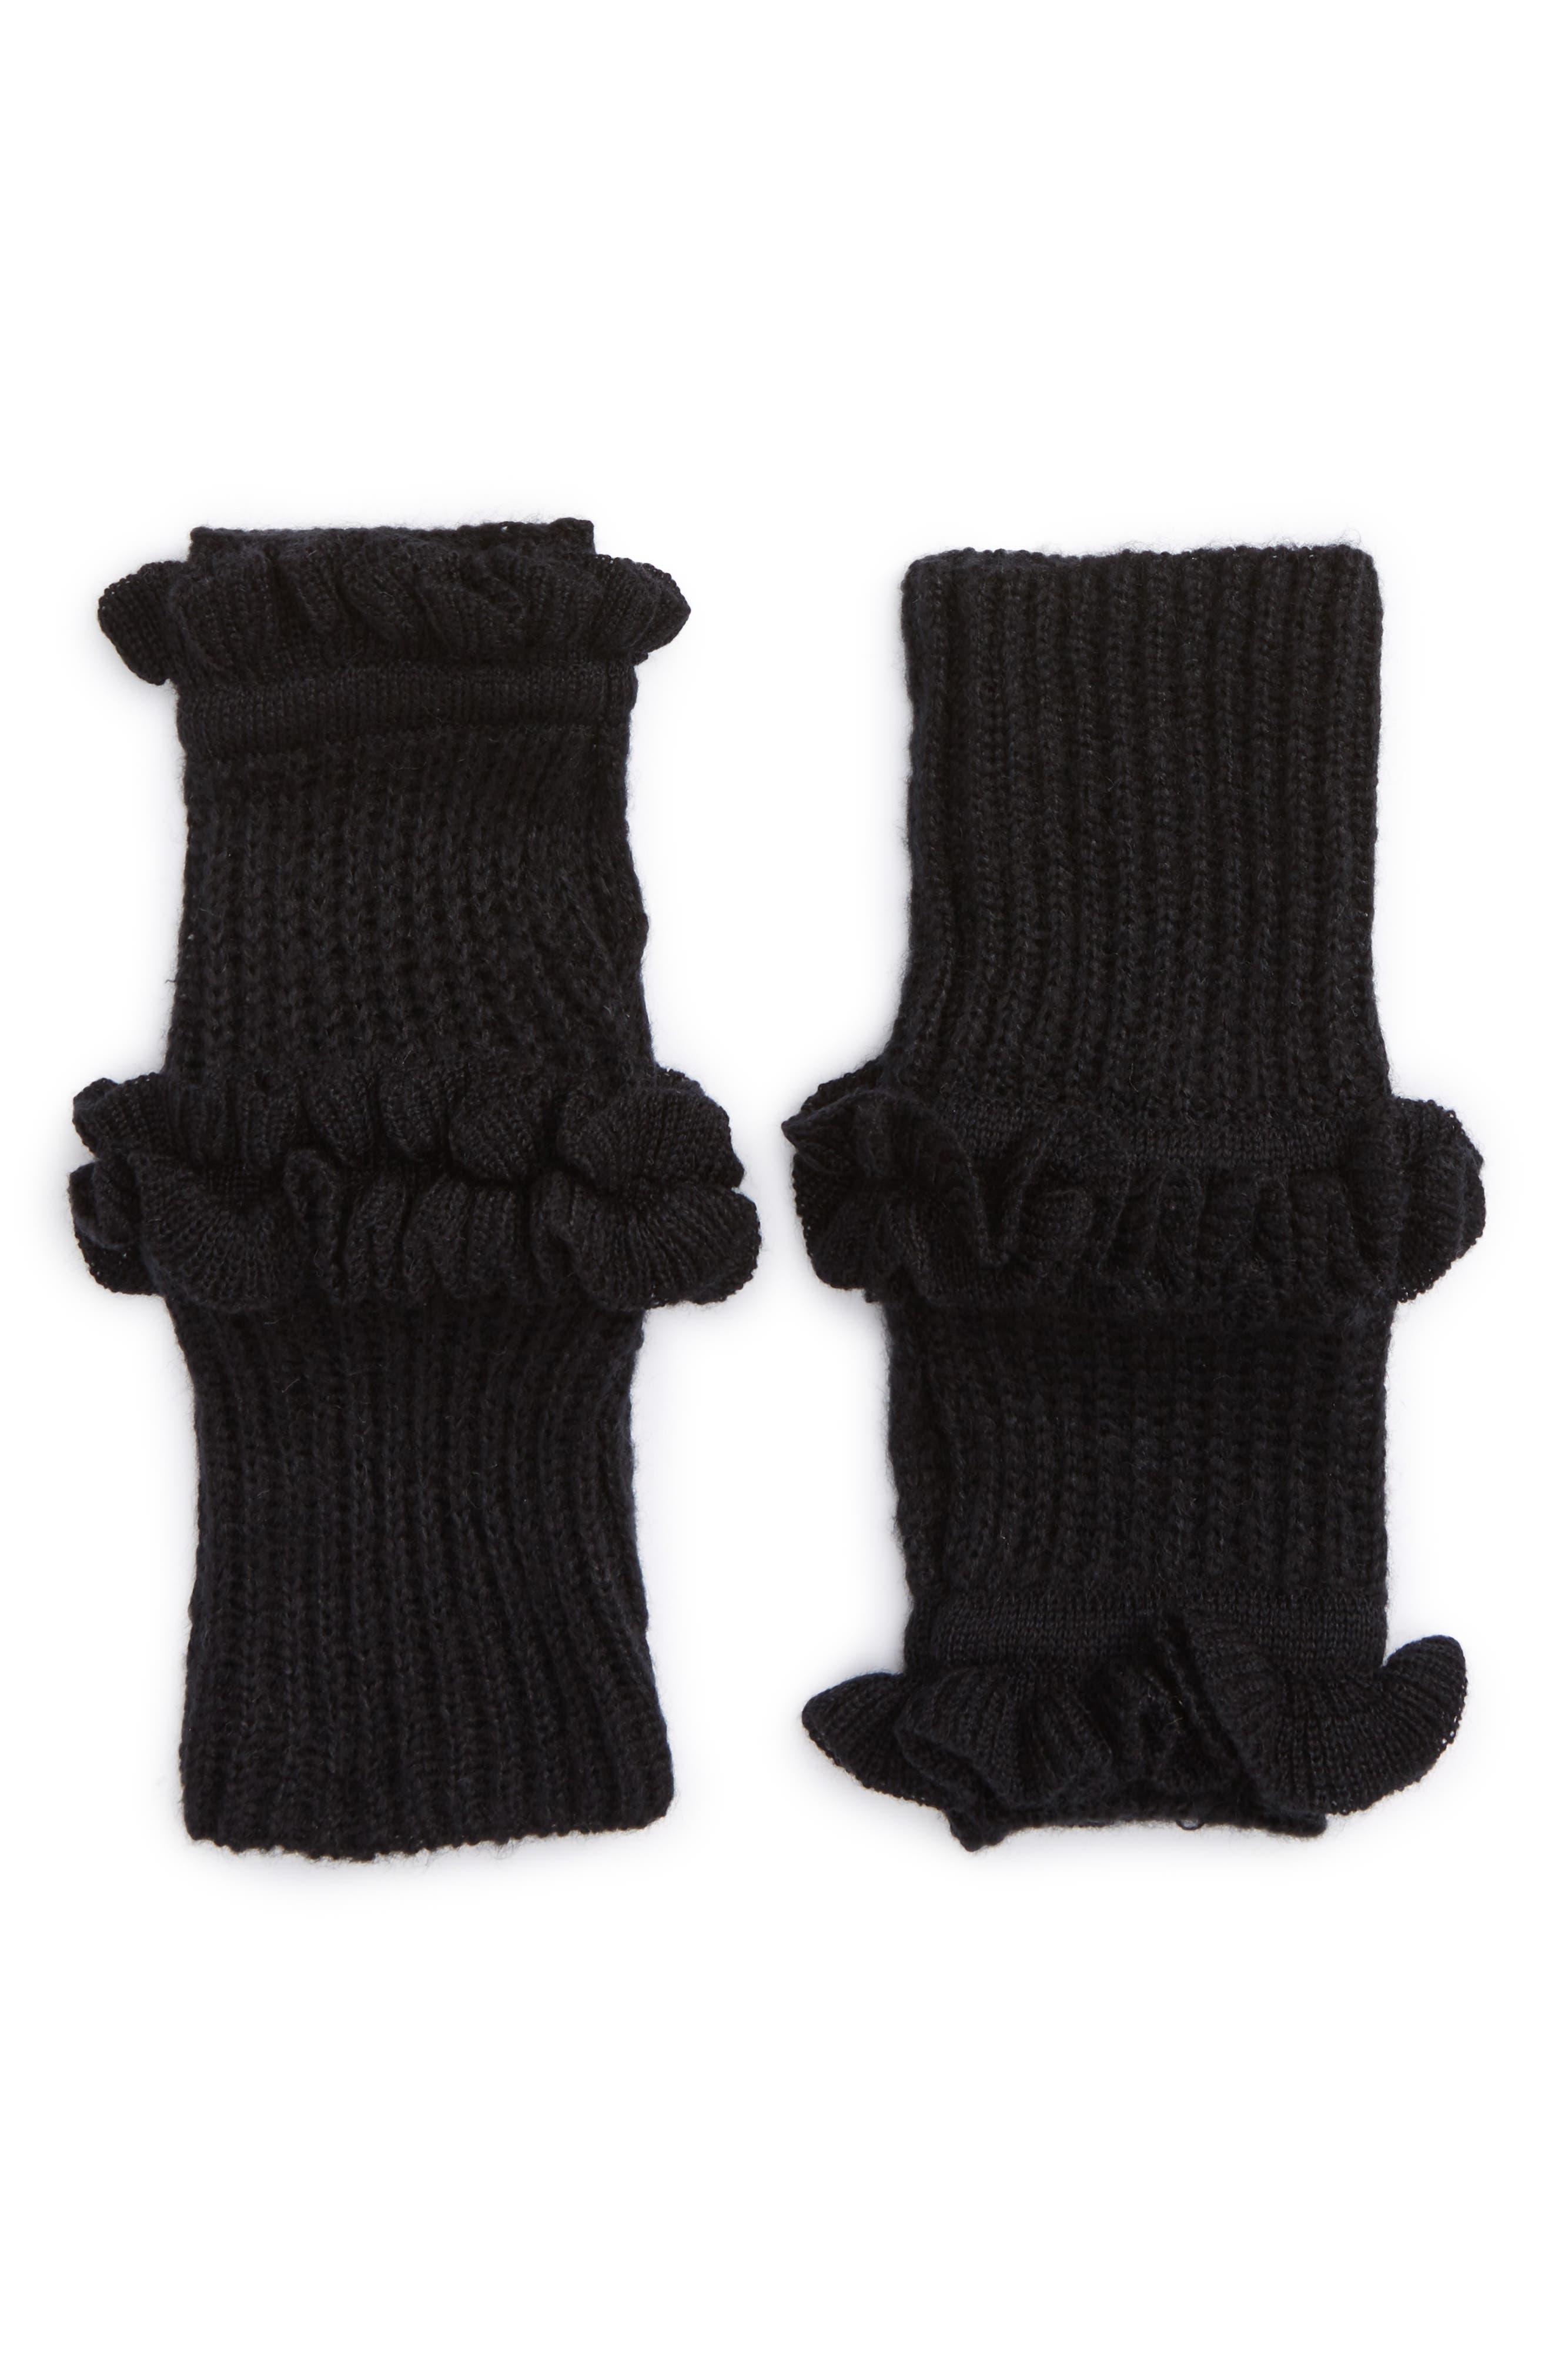 Main Image - Rebecca Minkoff Ruffle Fingerless Gloves